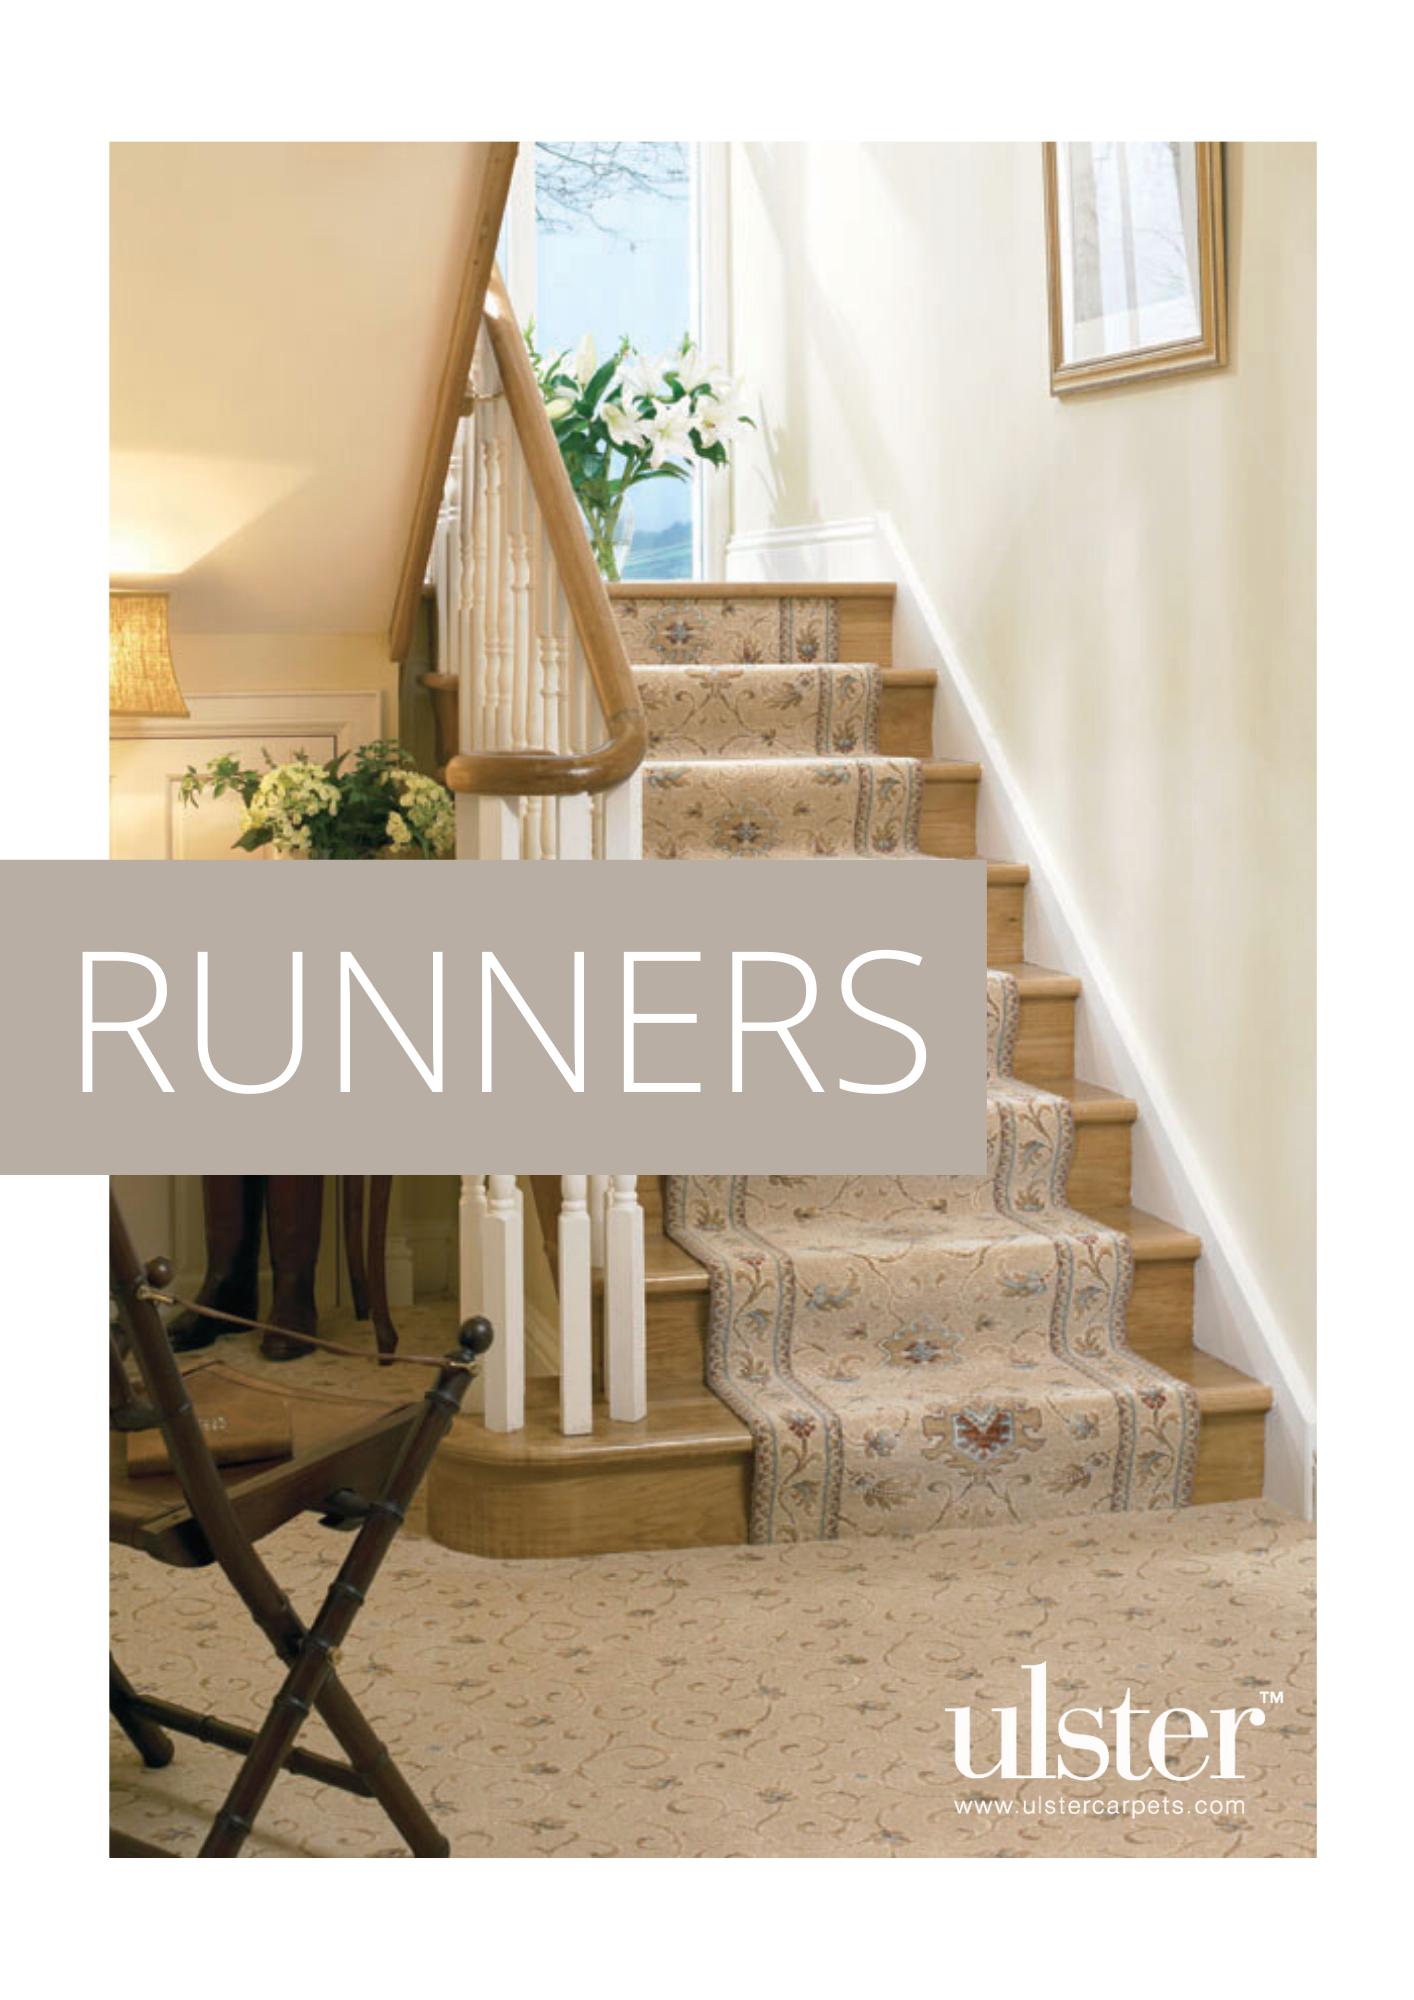 Runner Designs